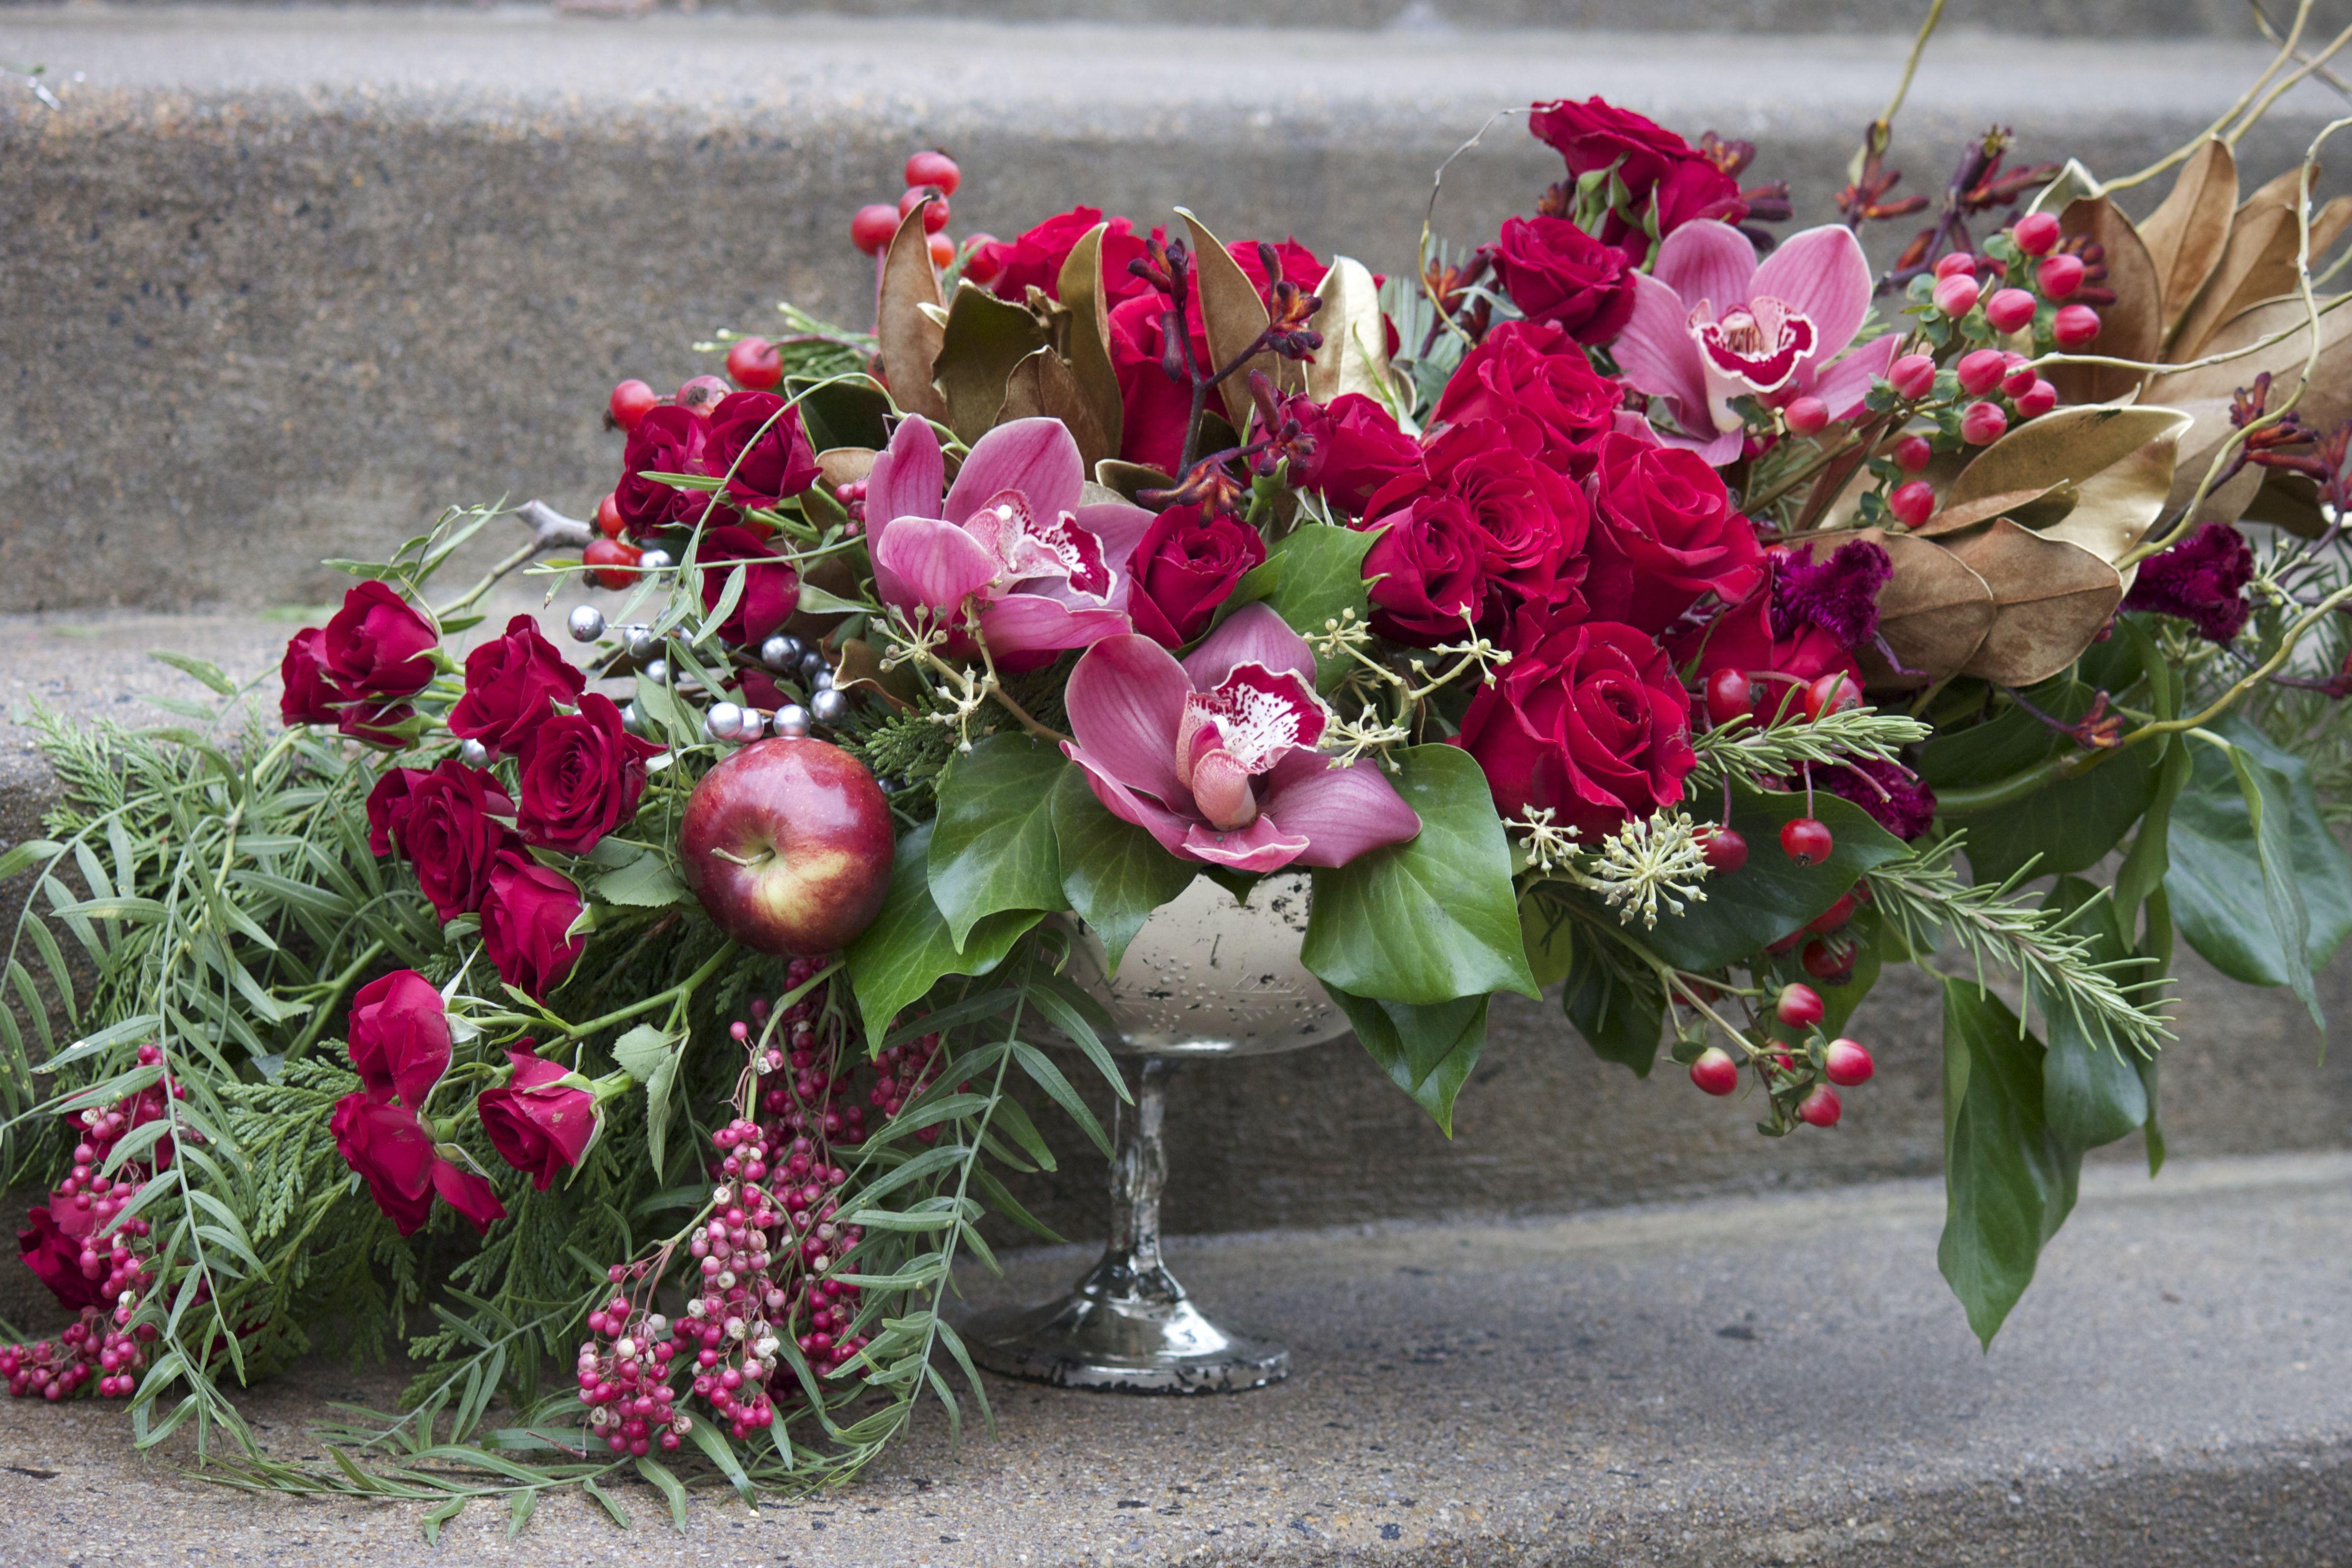 Avant-garde design, red roses, red Cymbidium orchids, apples, pepper-berry, spray roses, Hypericum berries, gold Magnolia leaves, rose hips, curly willow, bush ivy, cedar - mercury glass pedestal vase. Design by J. Morris Flowers